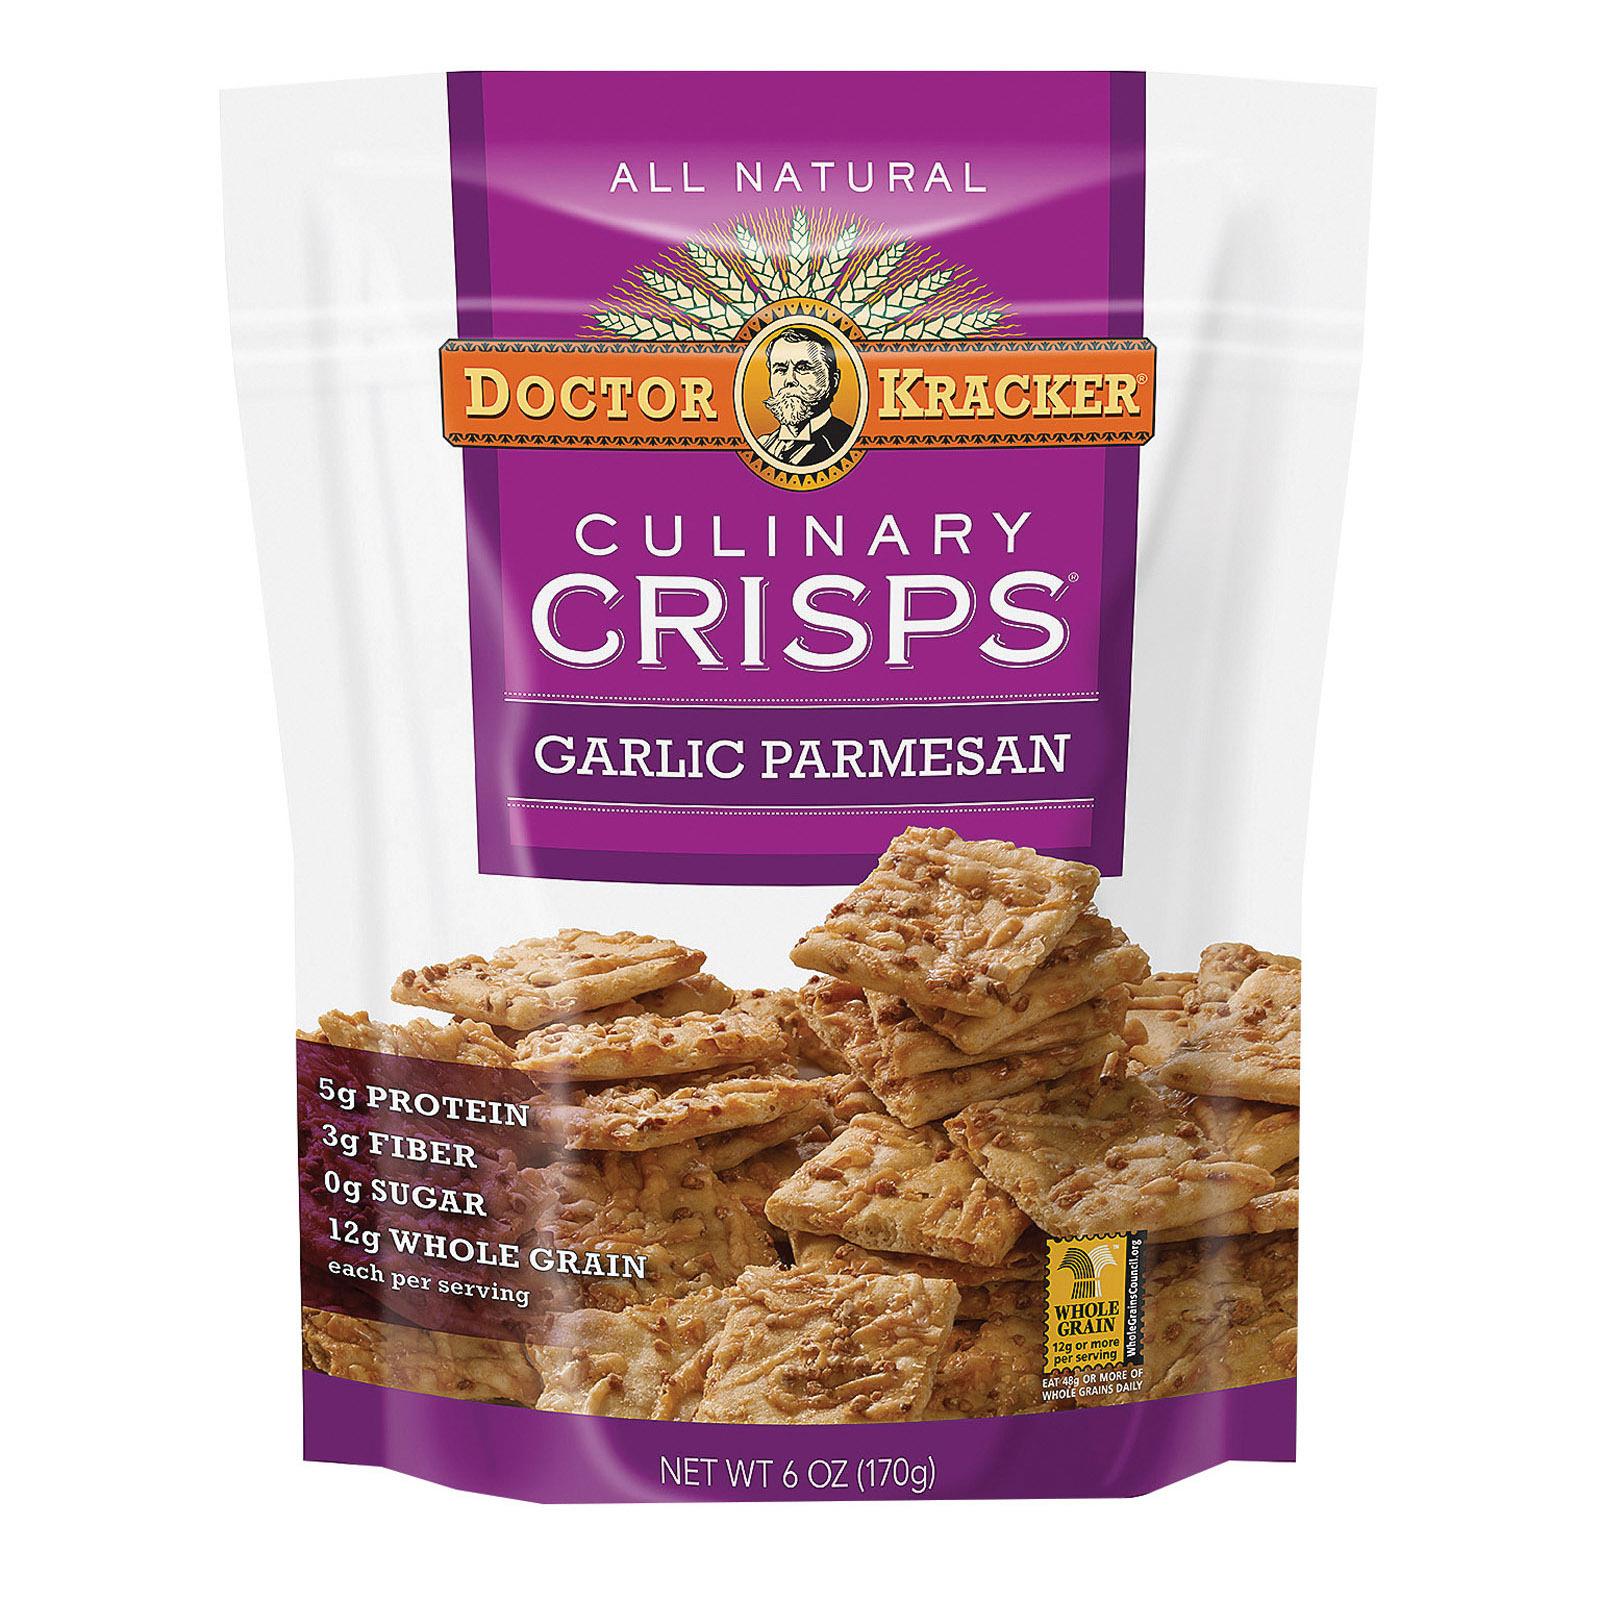 Doctor Kracker Garlic Parmesan Culinary Crisps - Case of 6 - 6 oz.